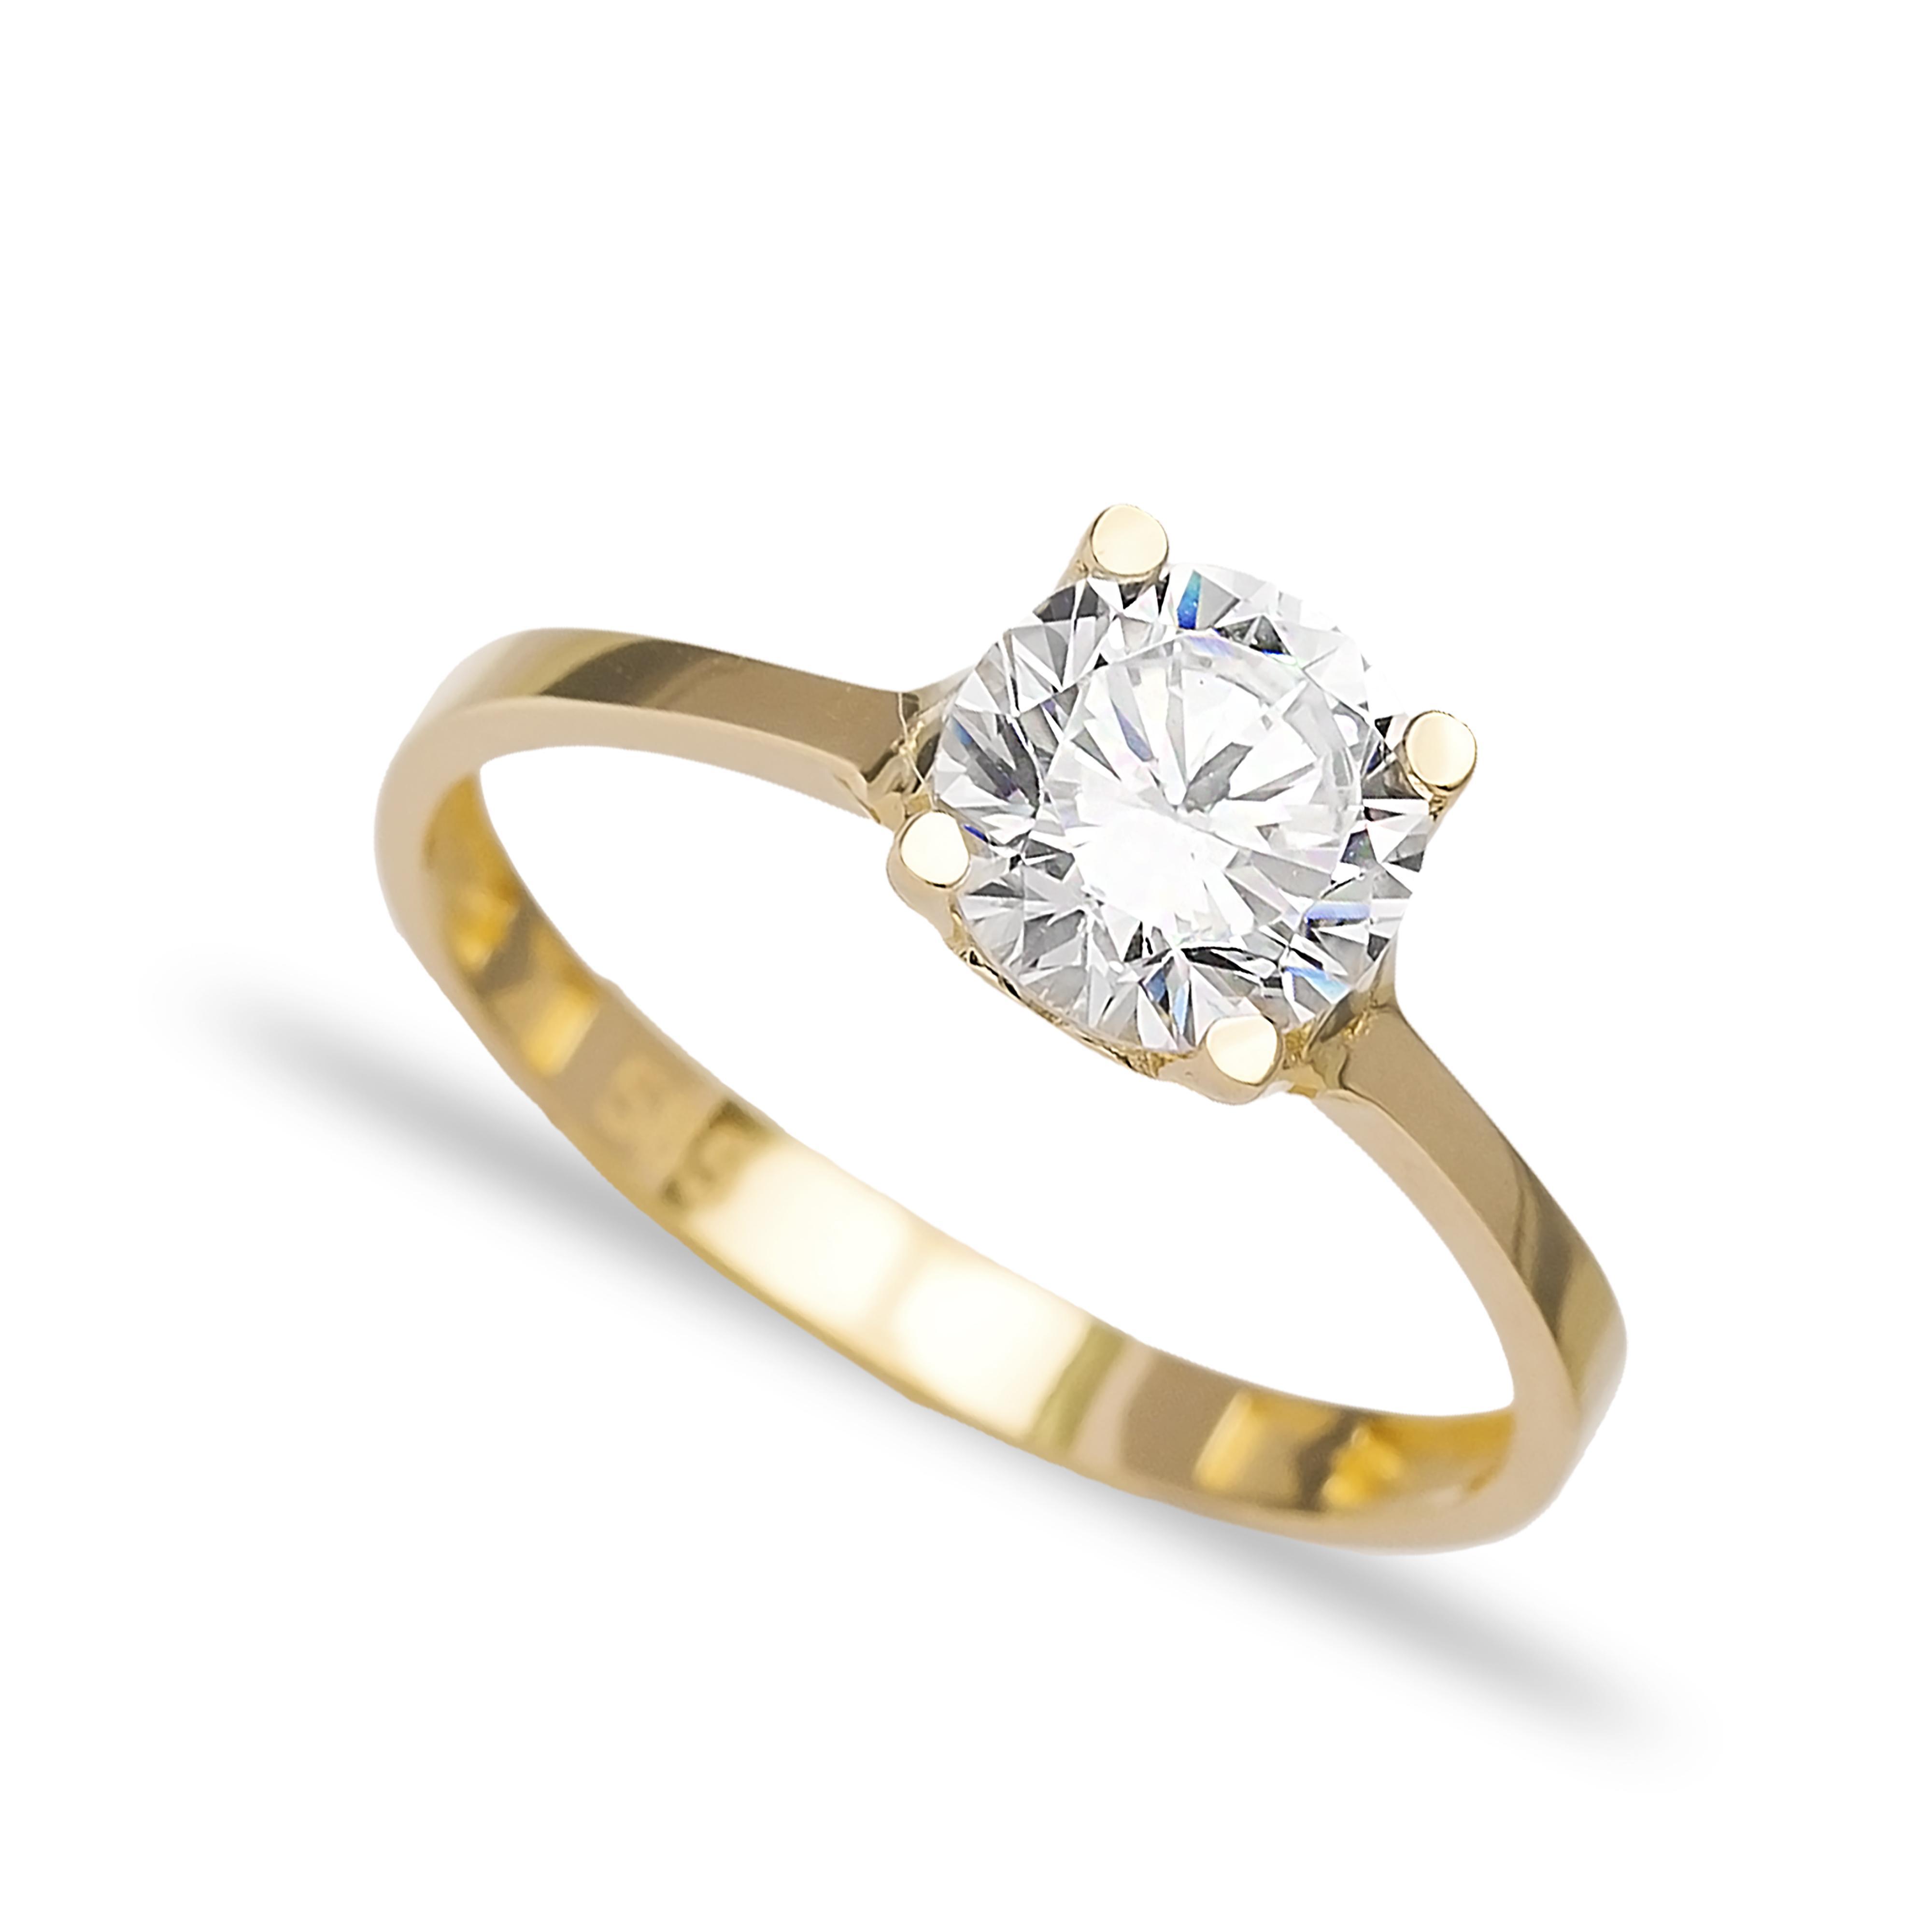 Engagement Solitaire 14 Karat Gold Zircon 7mm Wholesale Handmade Turkish Jewelry